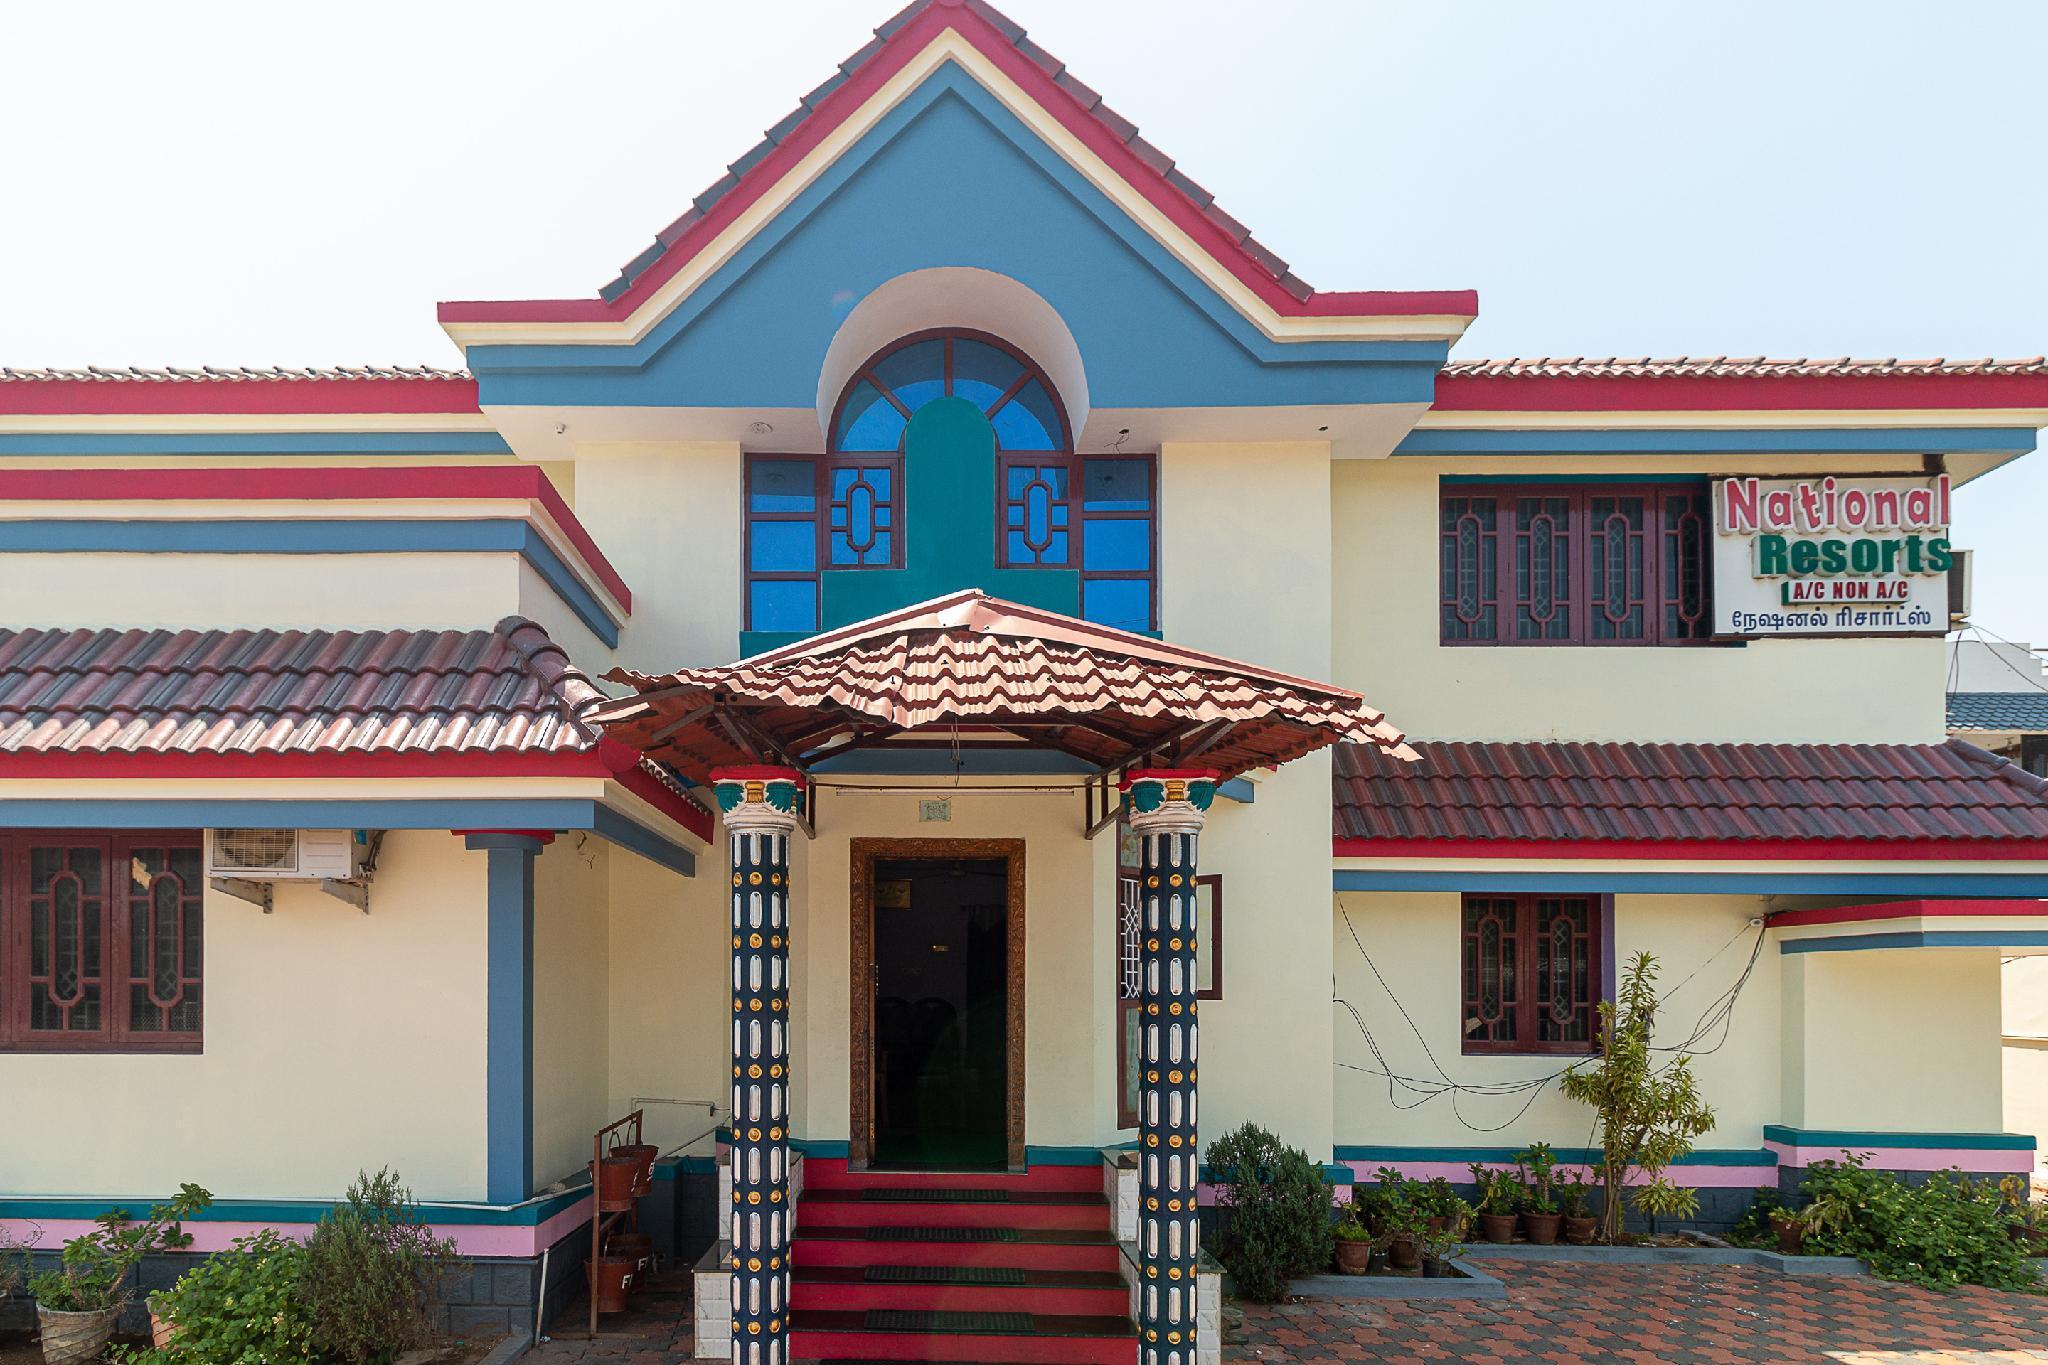 OYO 37410 National Resorts